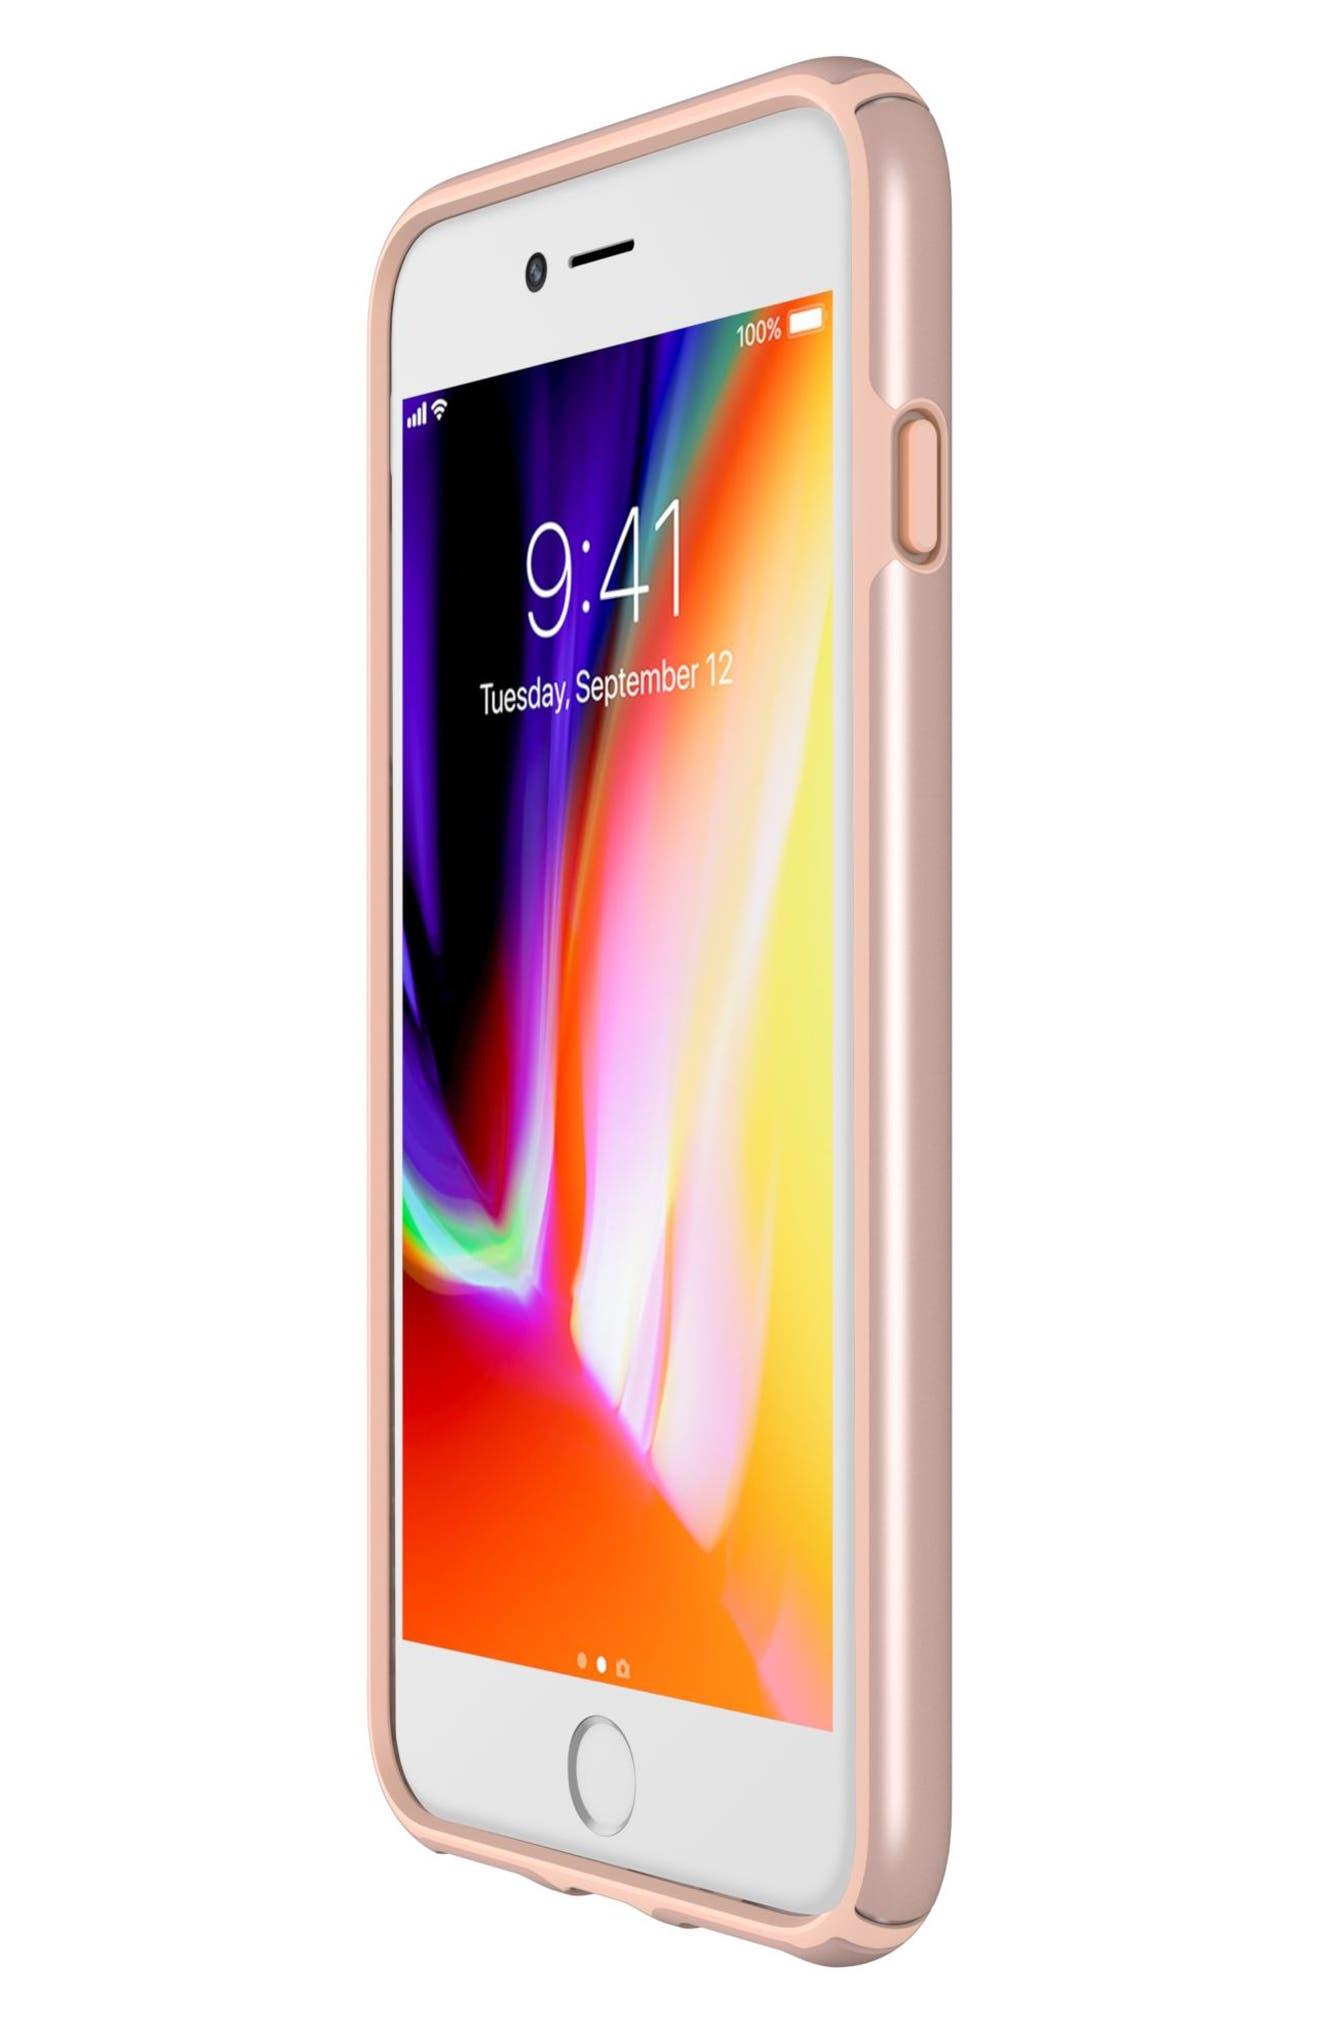 iPhone 6/6s/7/8 Plus Case,                             Alternate thumbnail 6, color,                             Rose Gold Metallic/ Peach